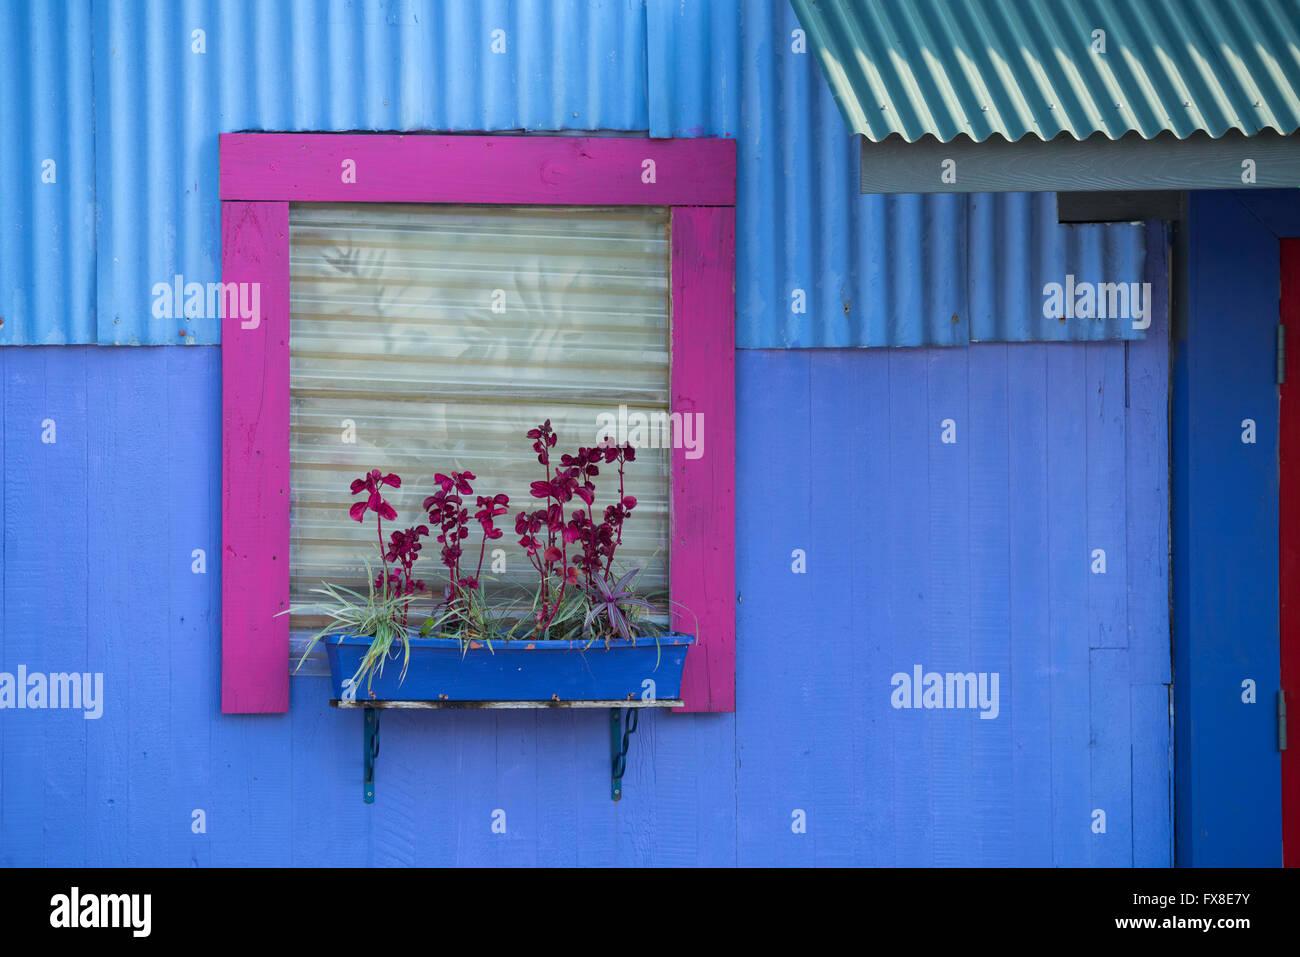 USA, Hawaii, Big Island, Hilo, window with orchids - Stock Image